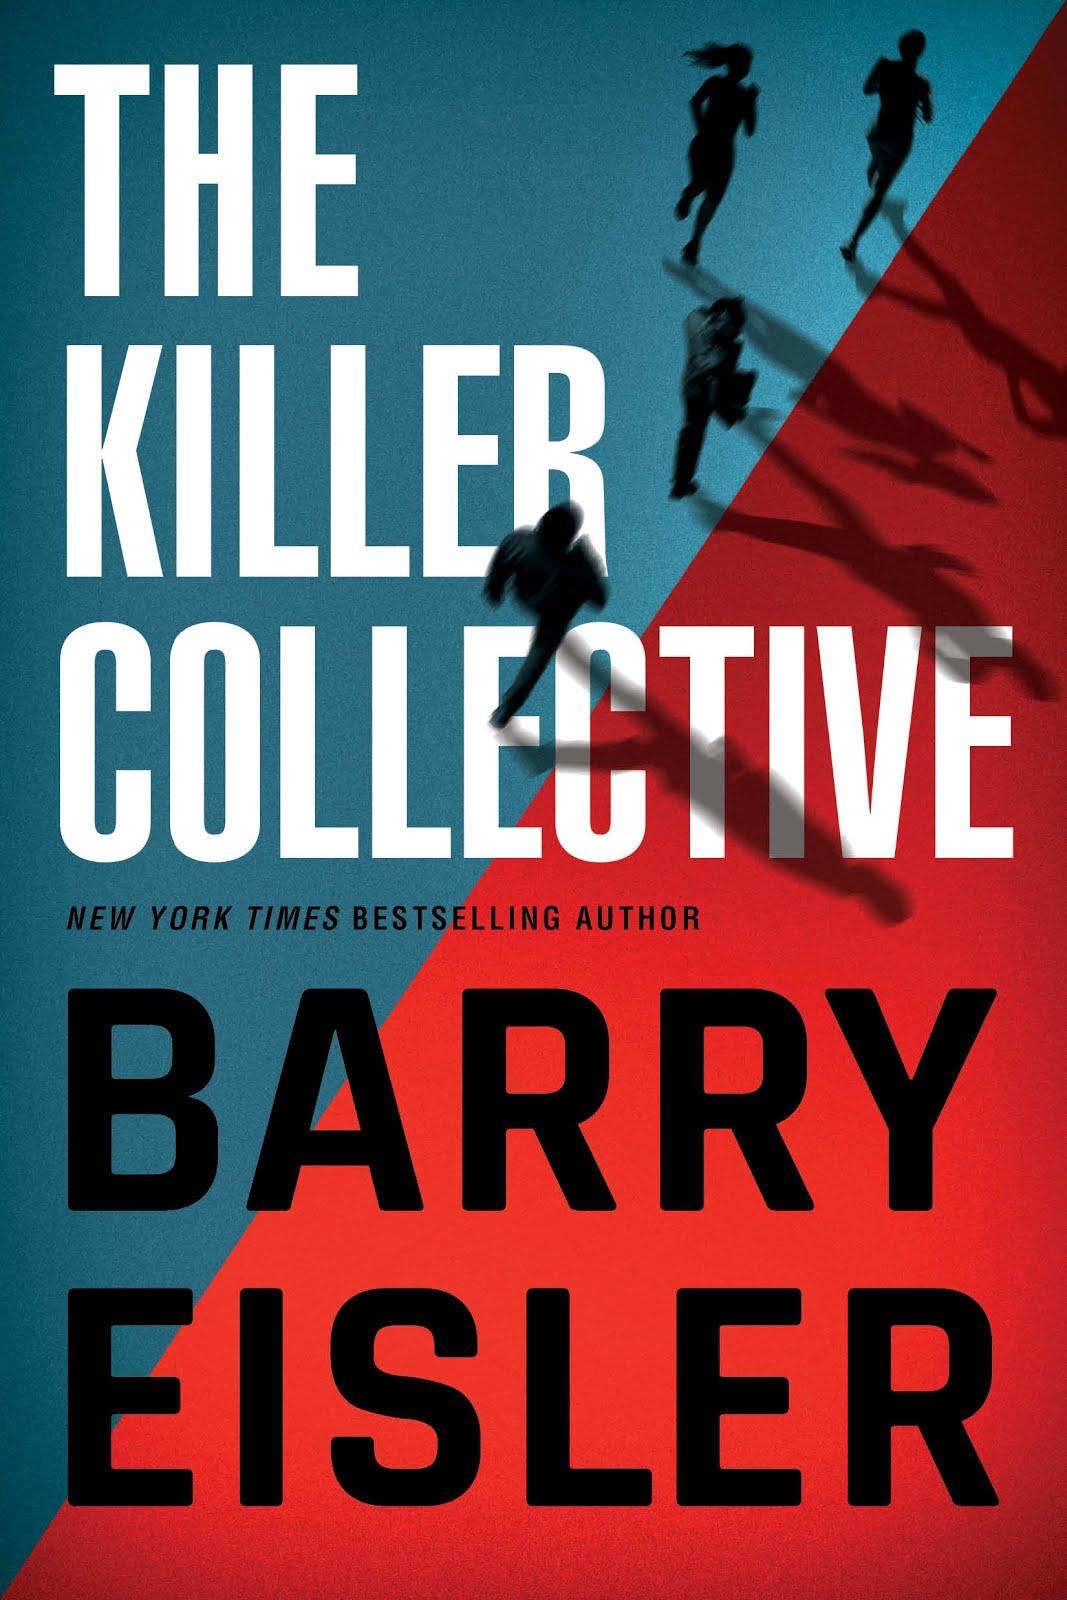 The Killer Collective_Barry Eisler.jpg